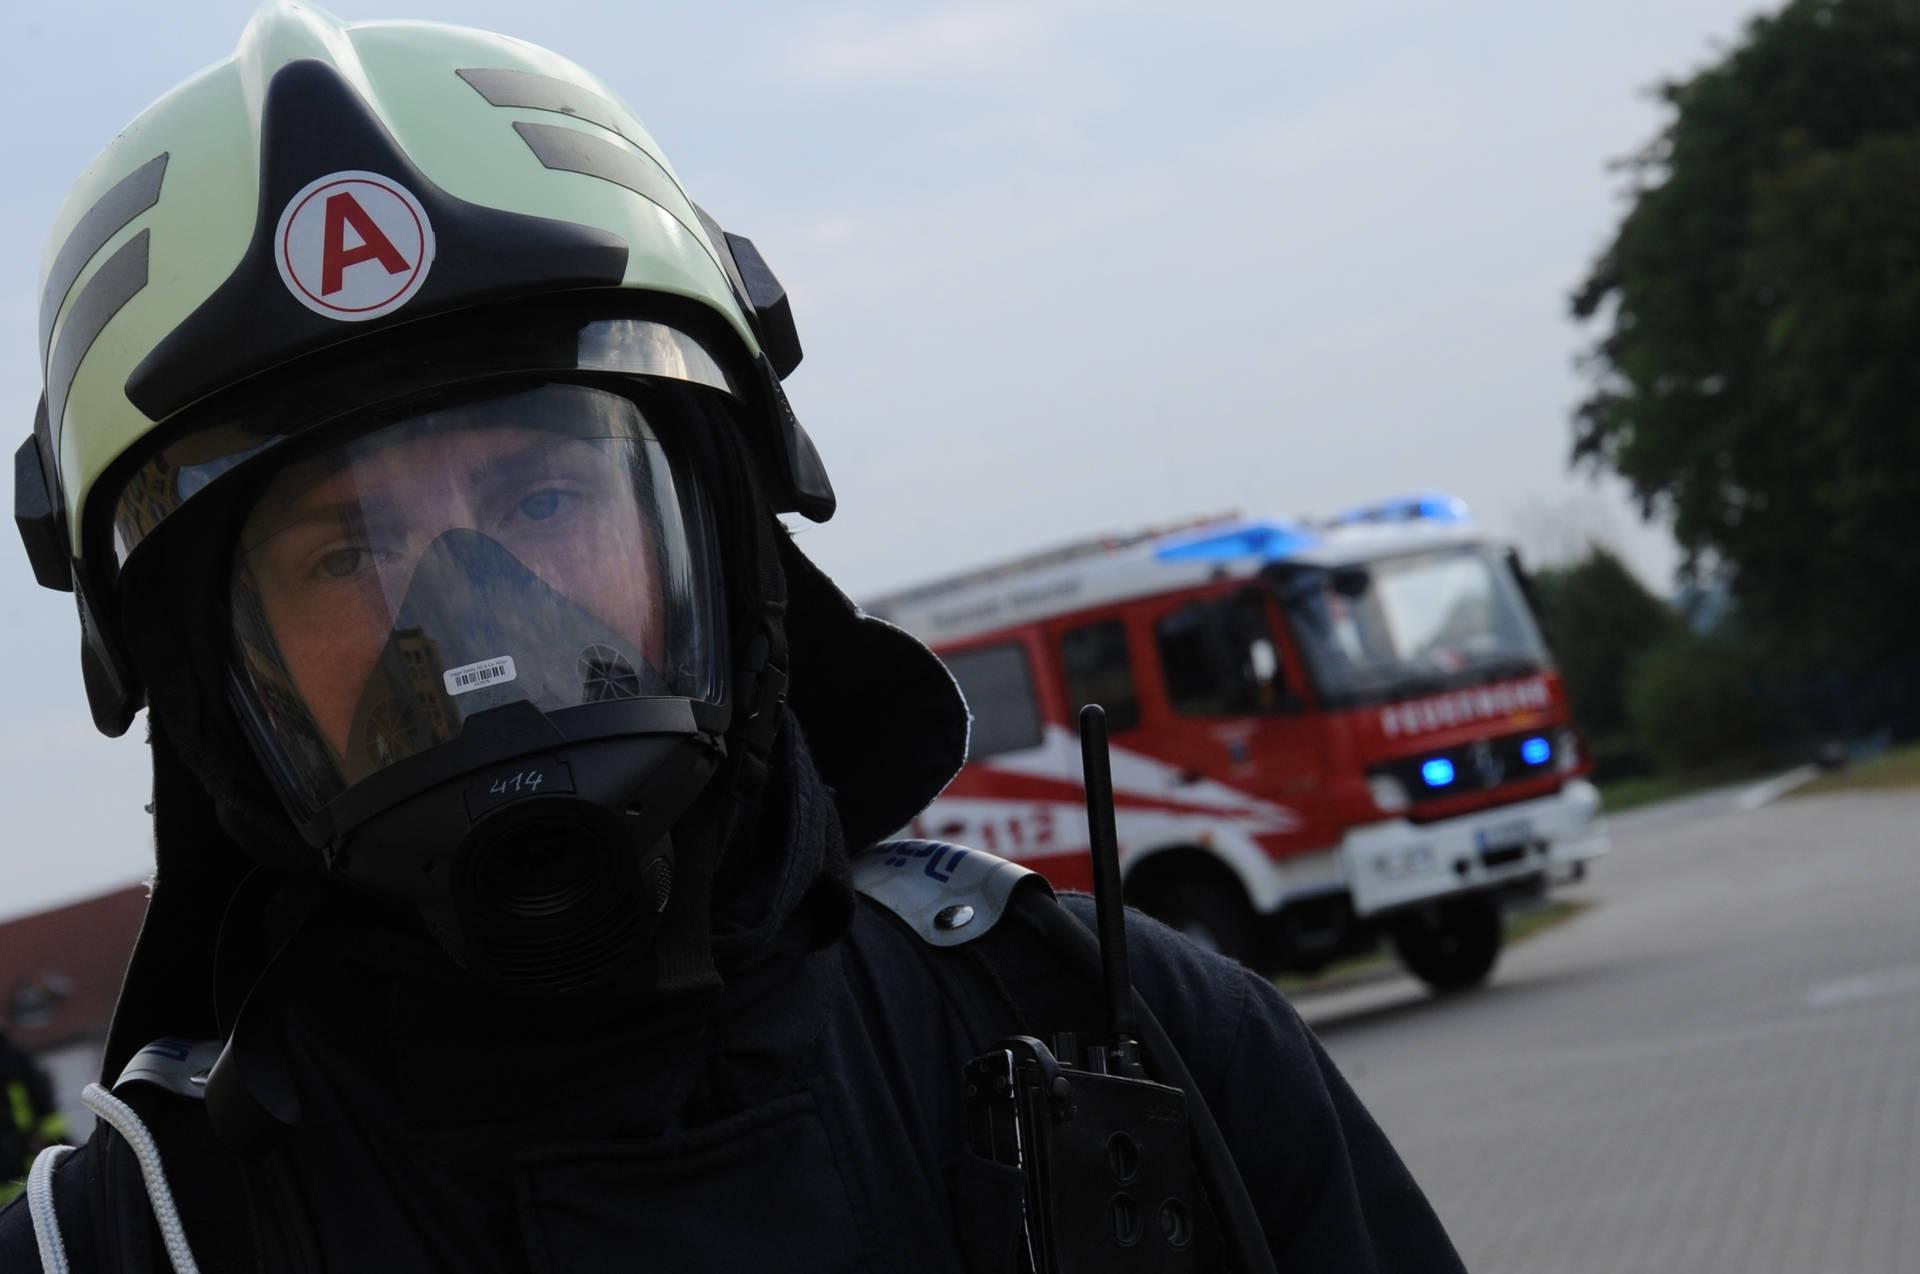 Katastrophenschutz%c3%bcbung krankenhaus grimma  2012 %2810%29